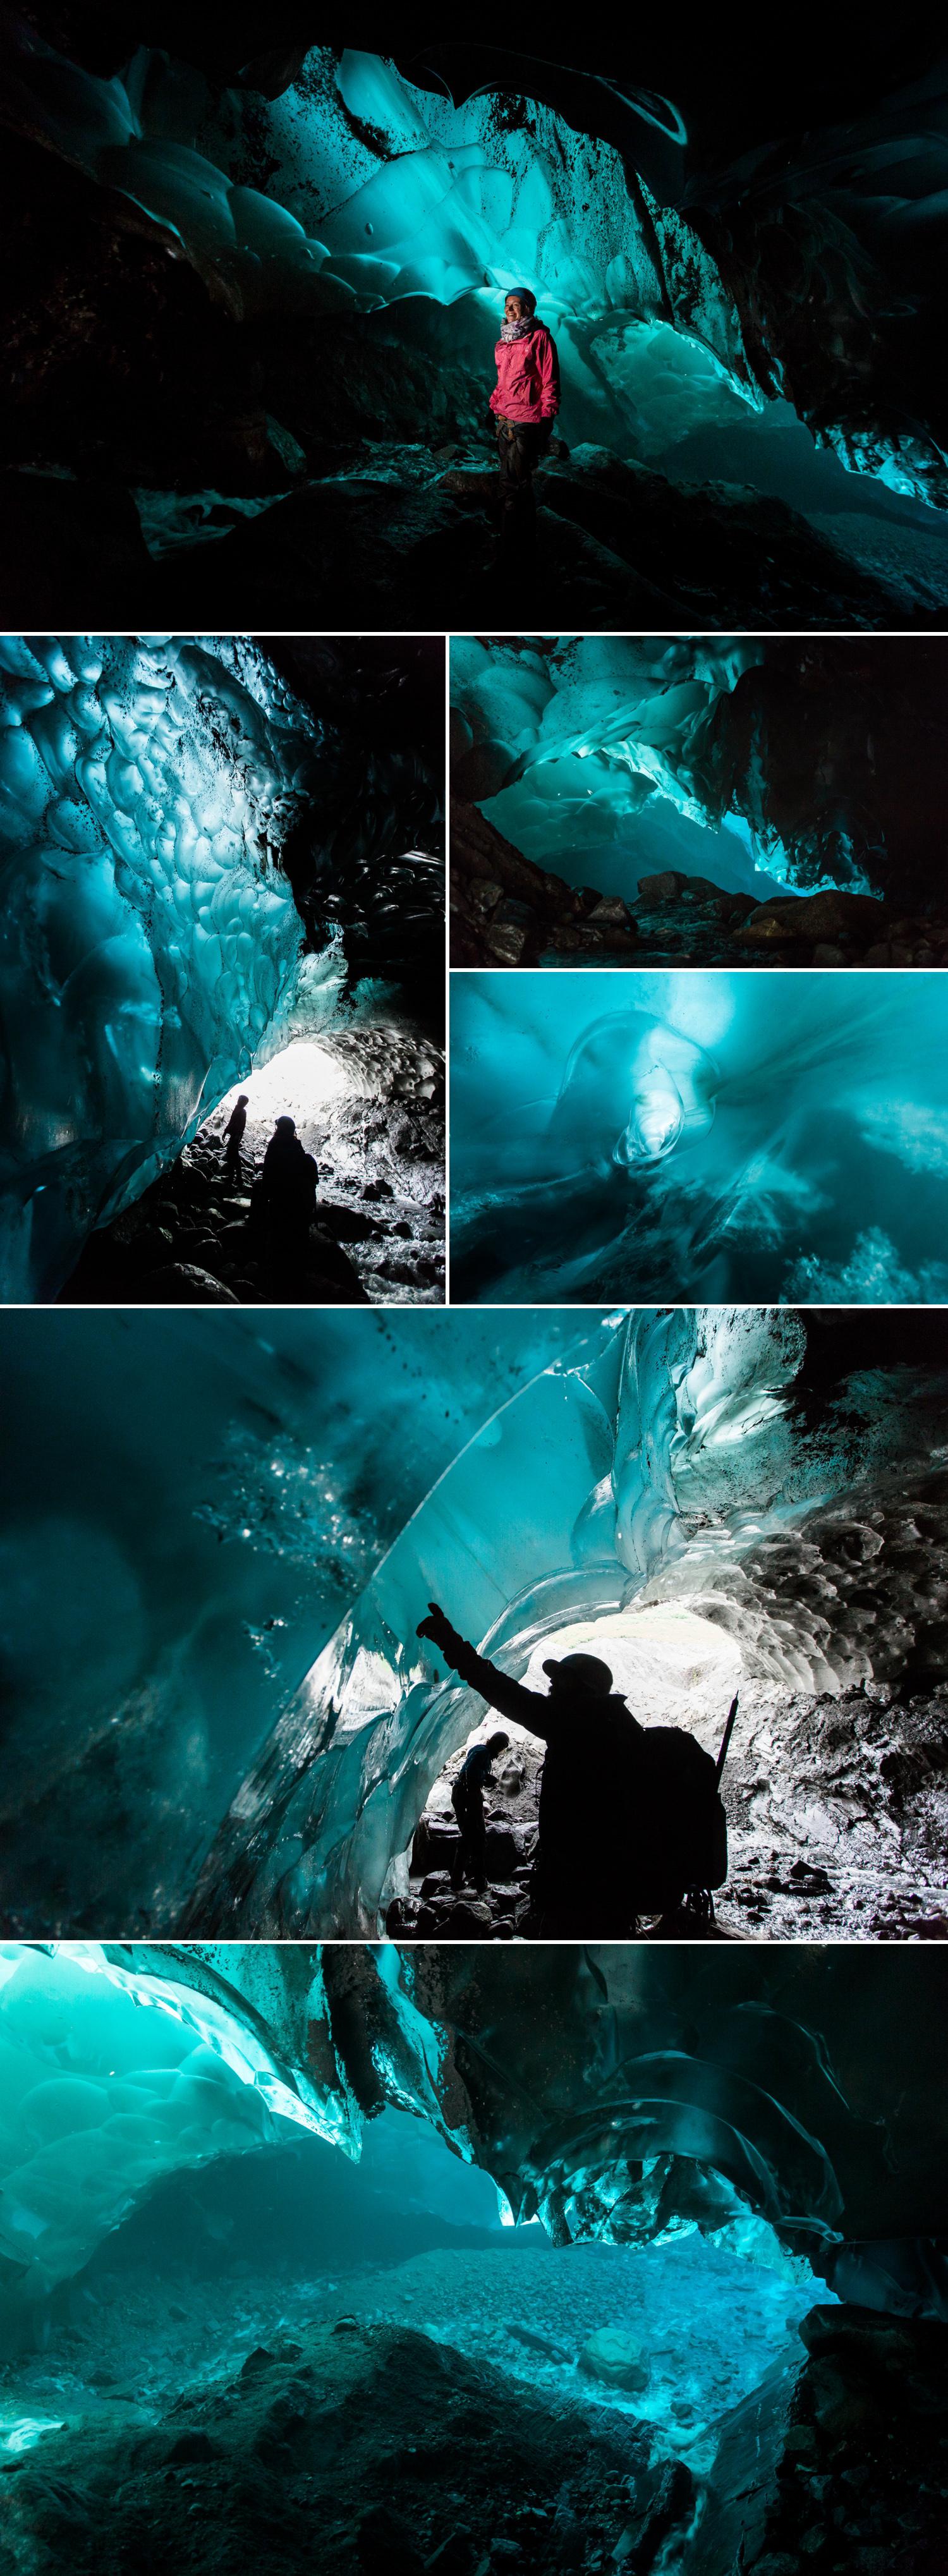 cameron-zegers-photography-alaska-uncruise-travel-19.jpg